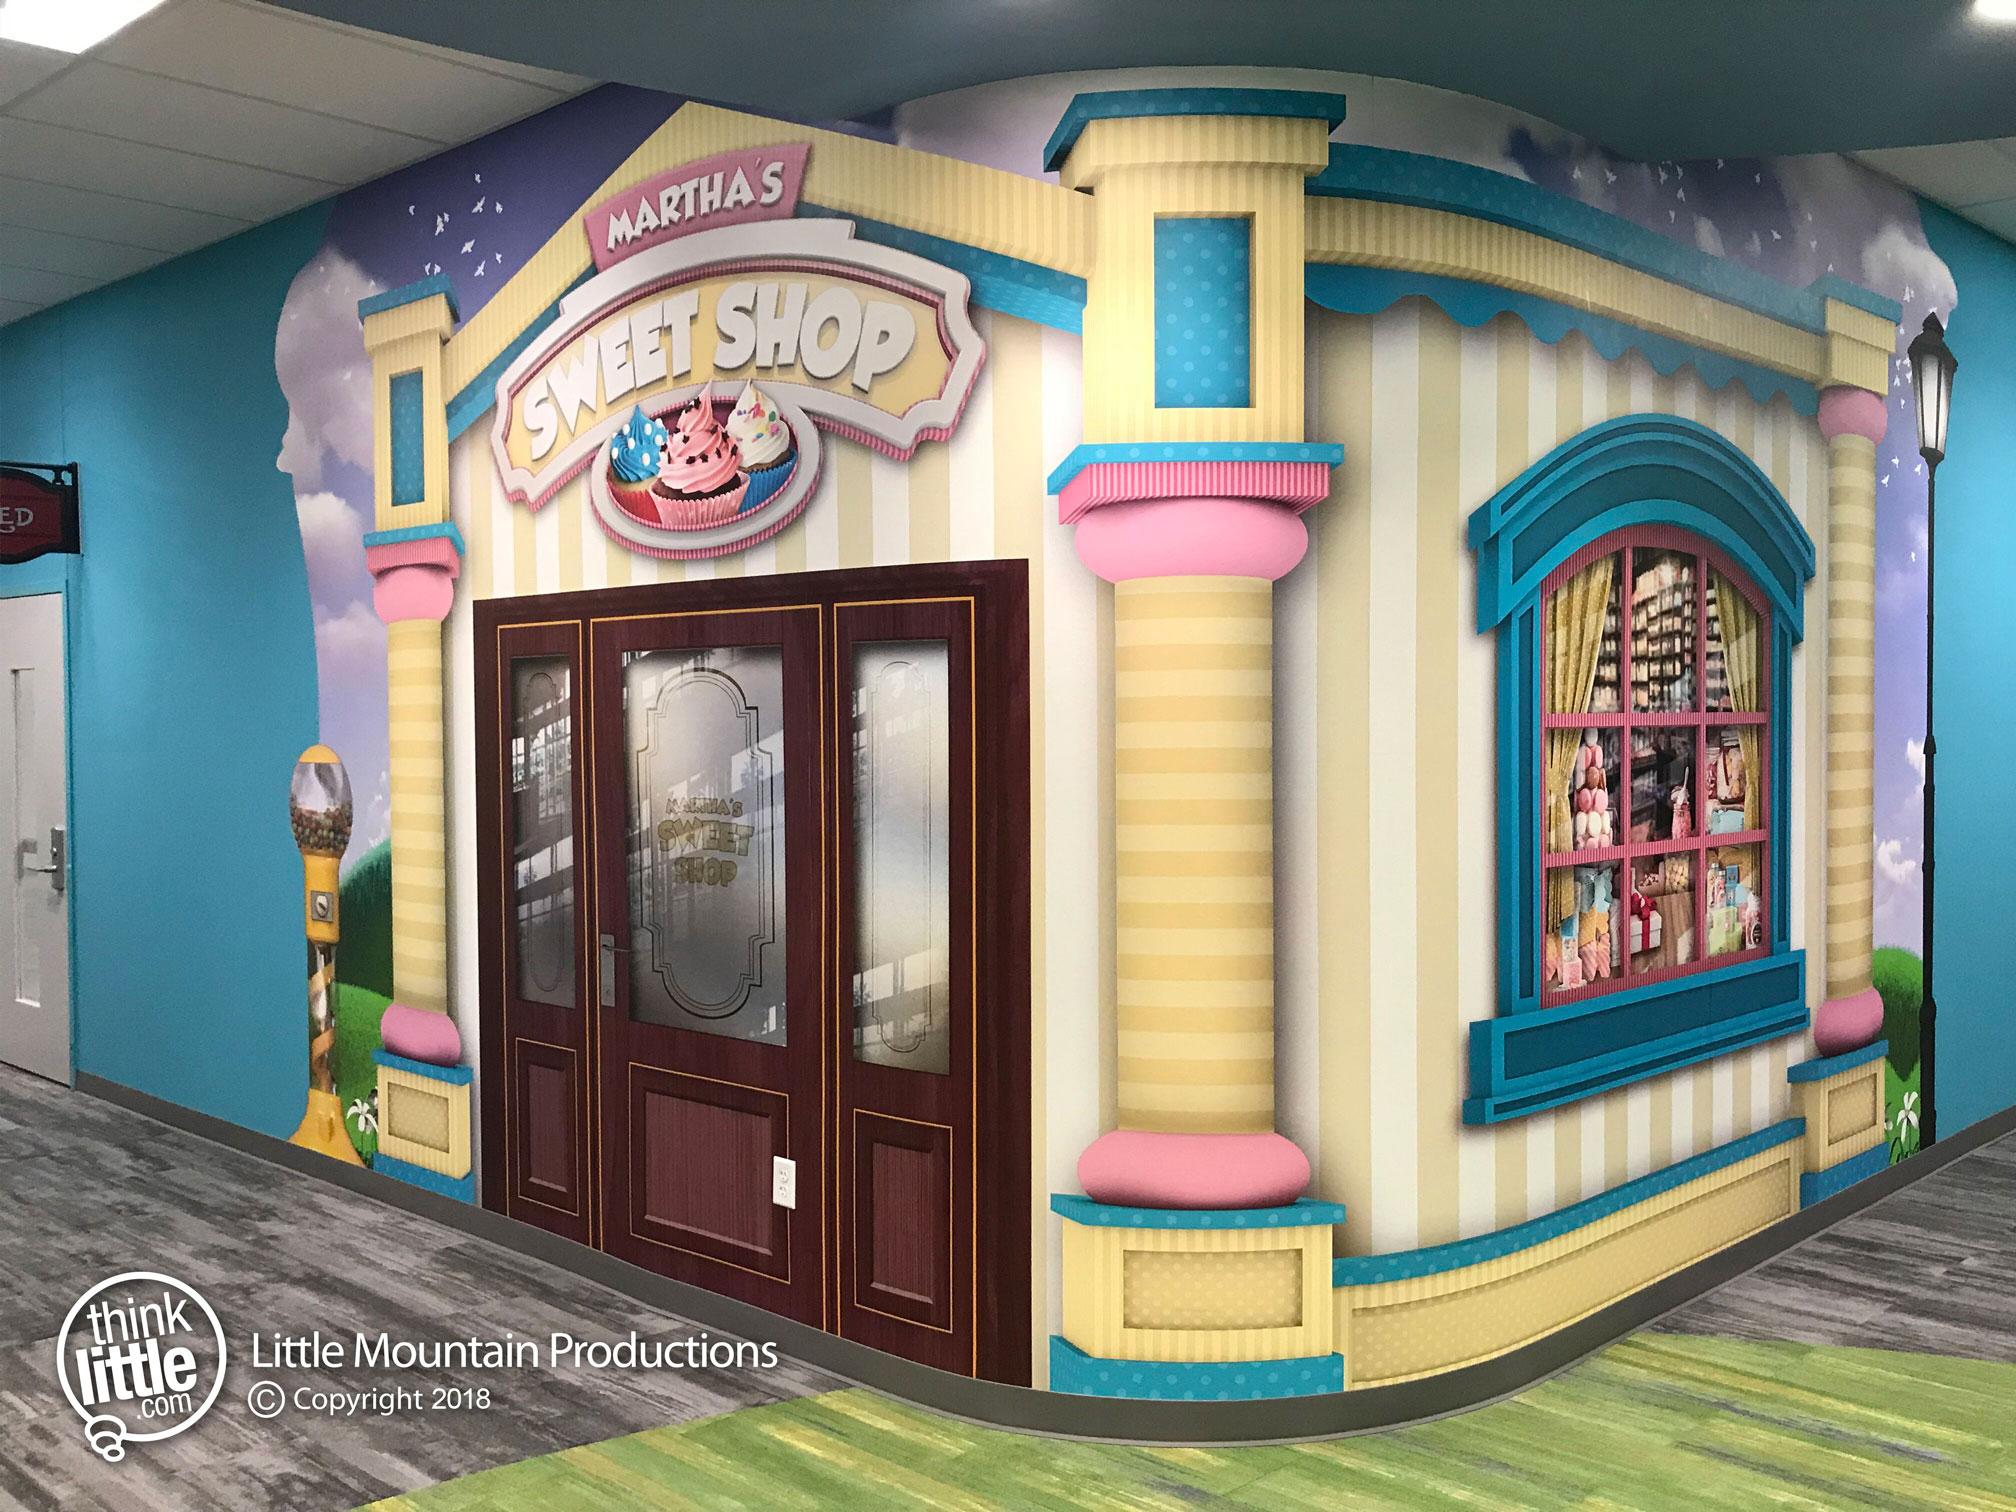 Central-Martha's-Sweet-Shop